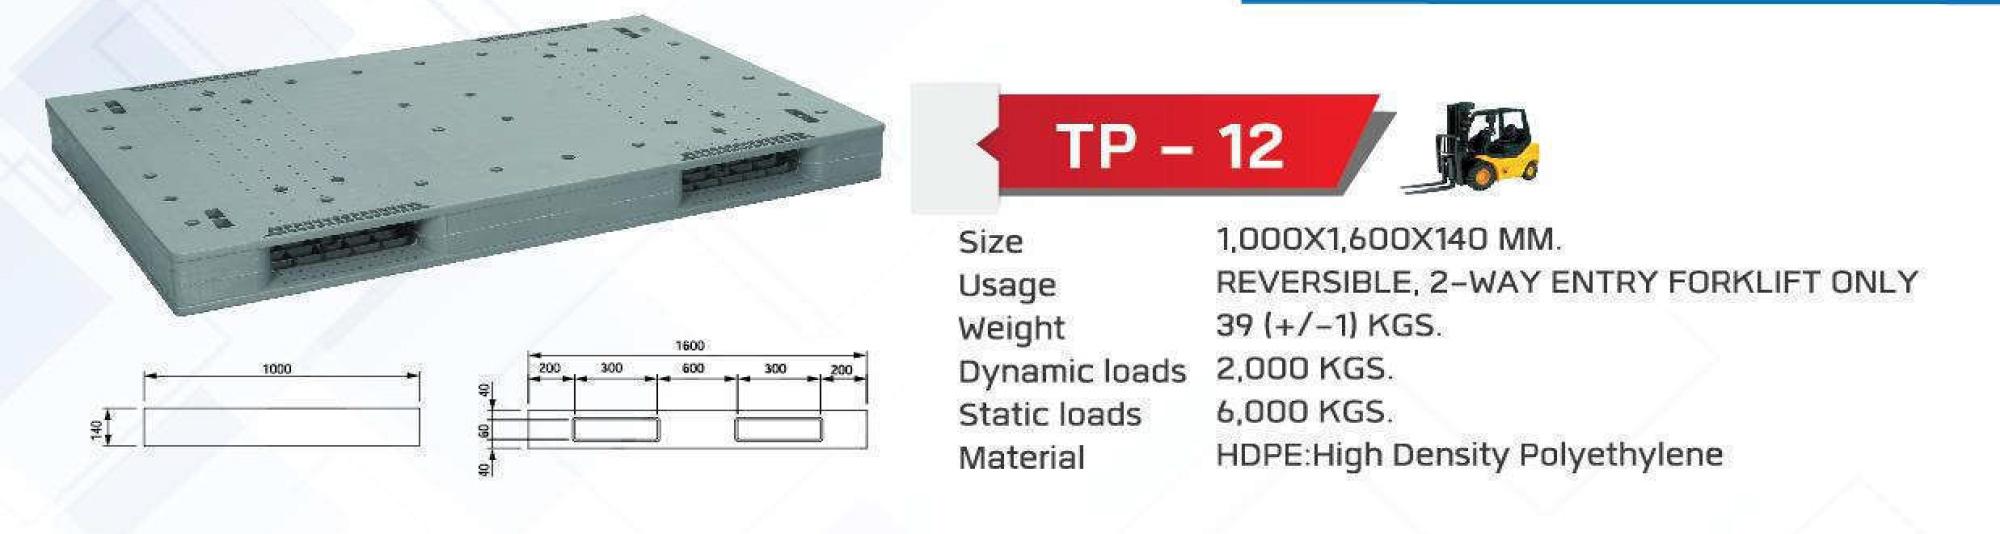 Reversible-HeavyDuty-TP-12